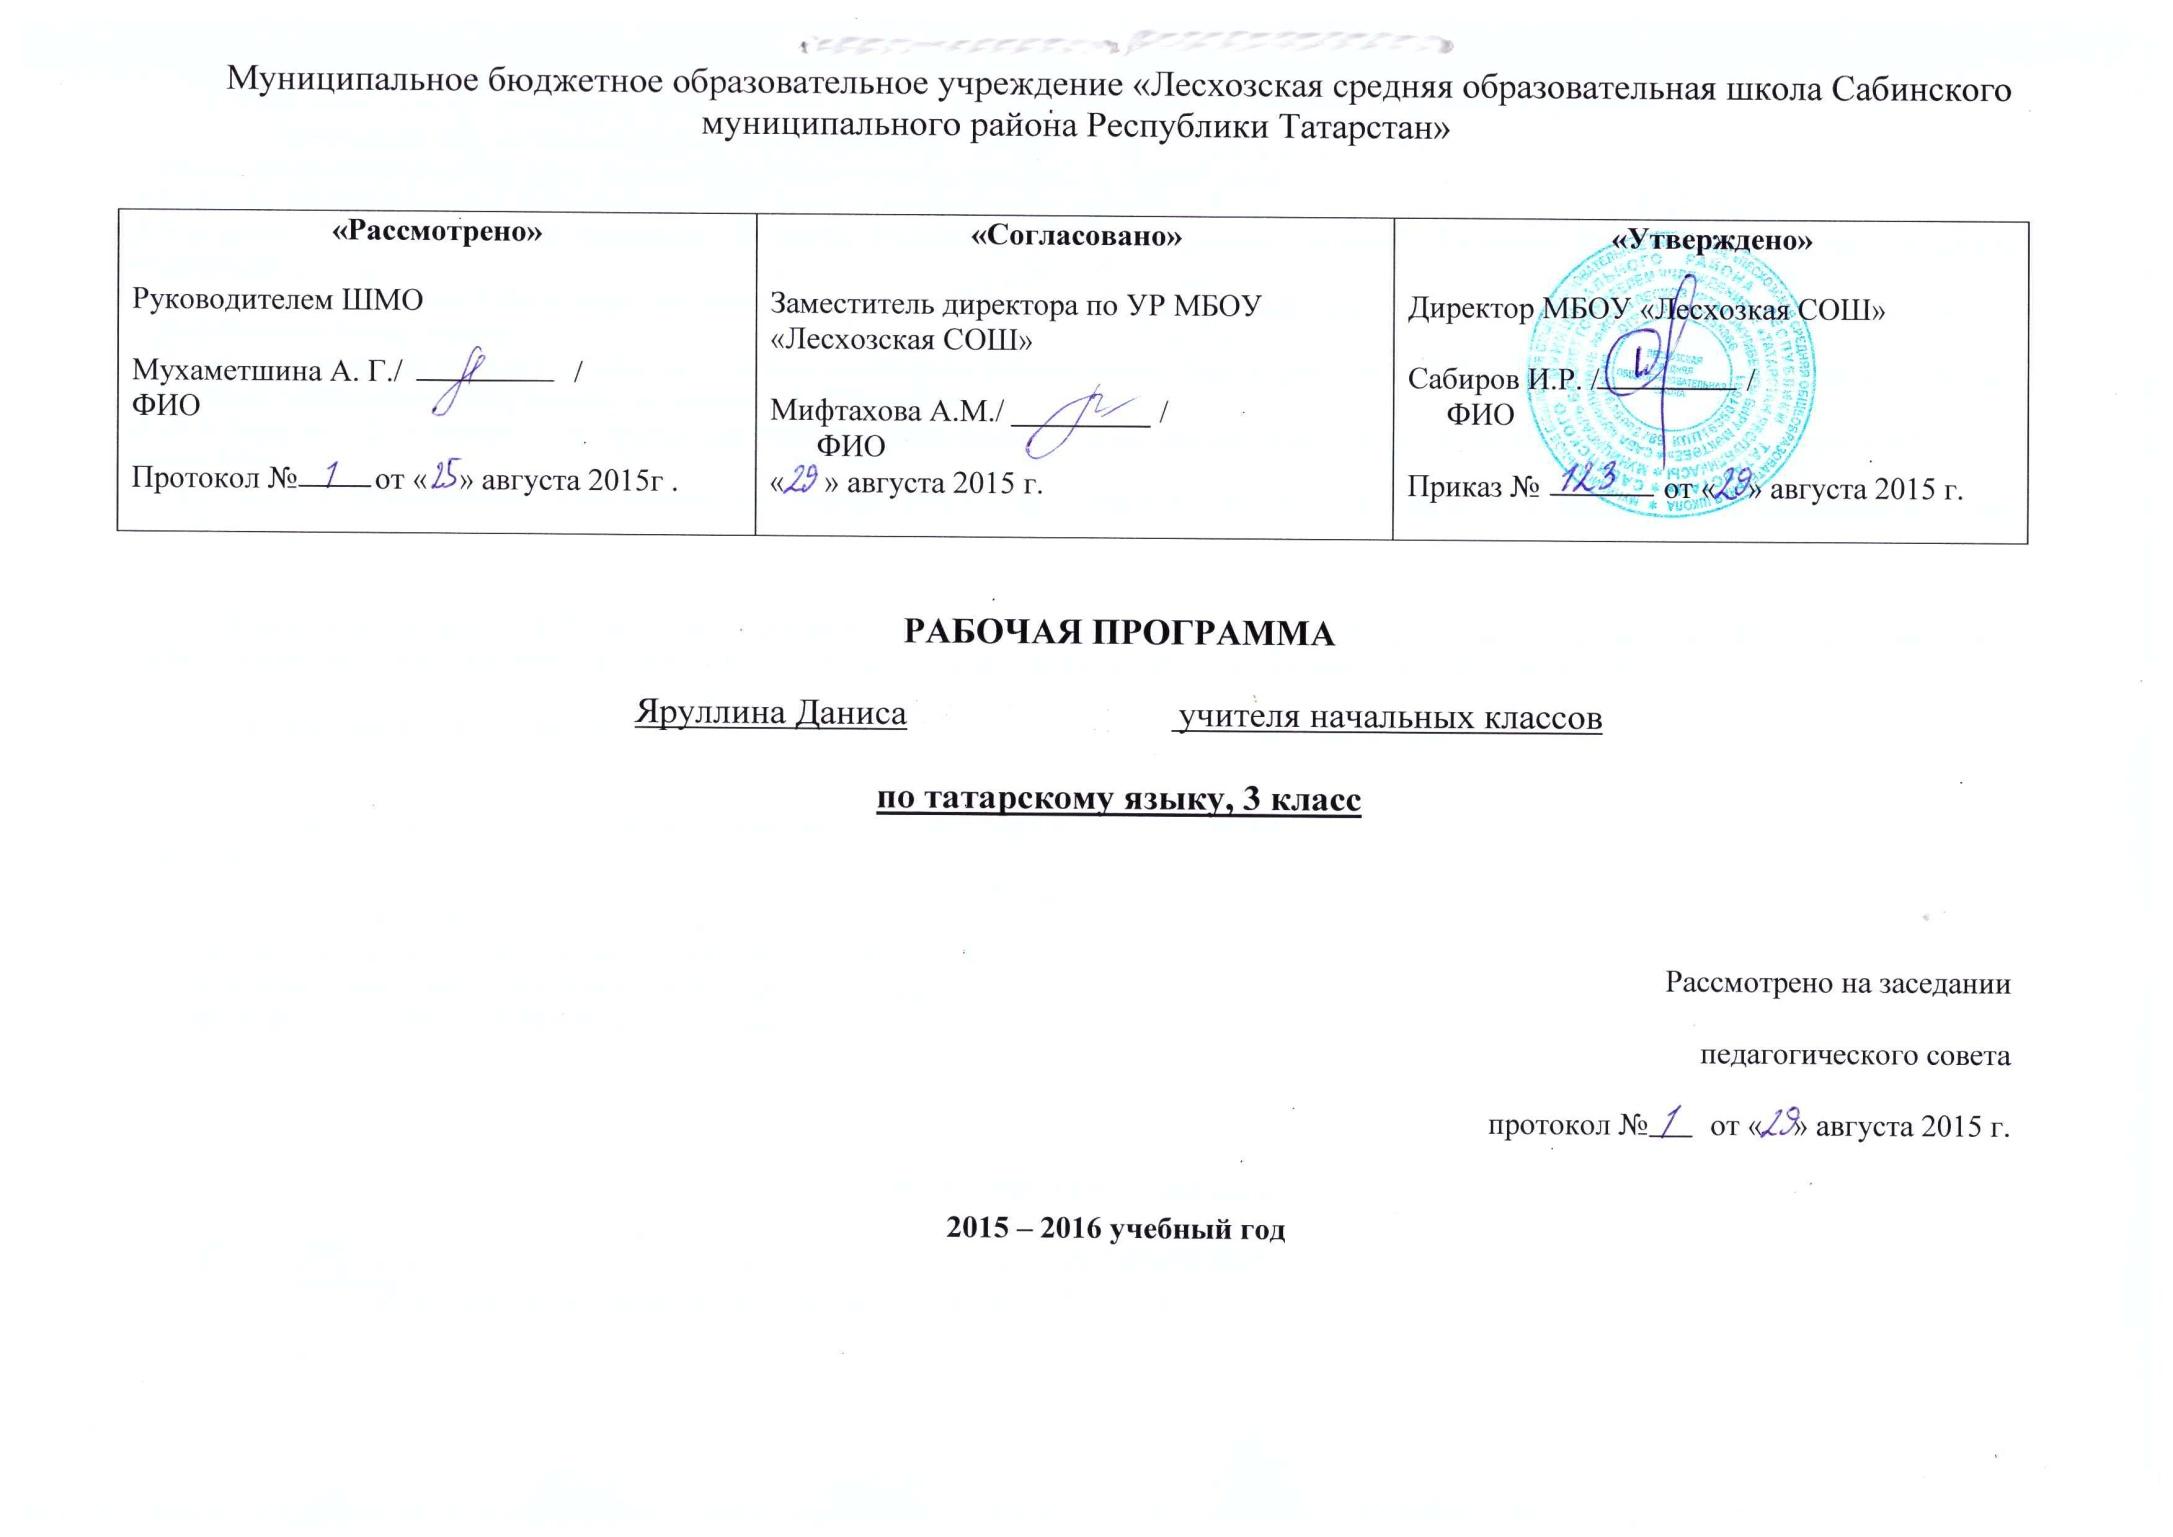 F:\прочие документы\Untitled_20151002_003910.jpg